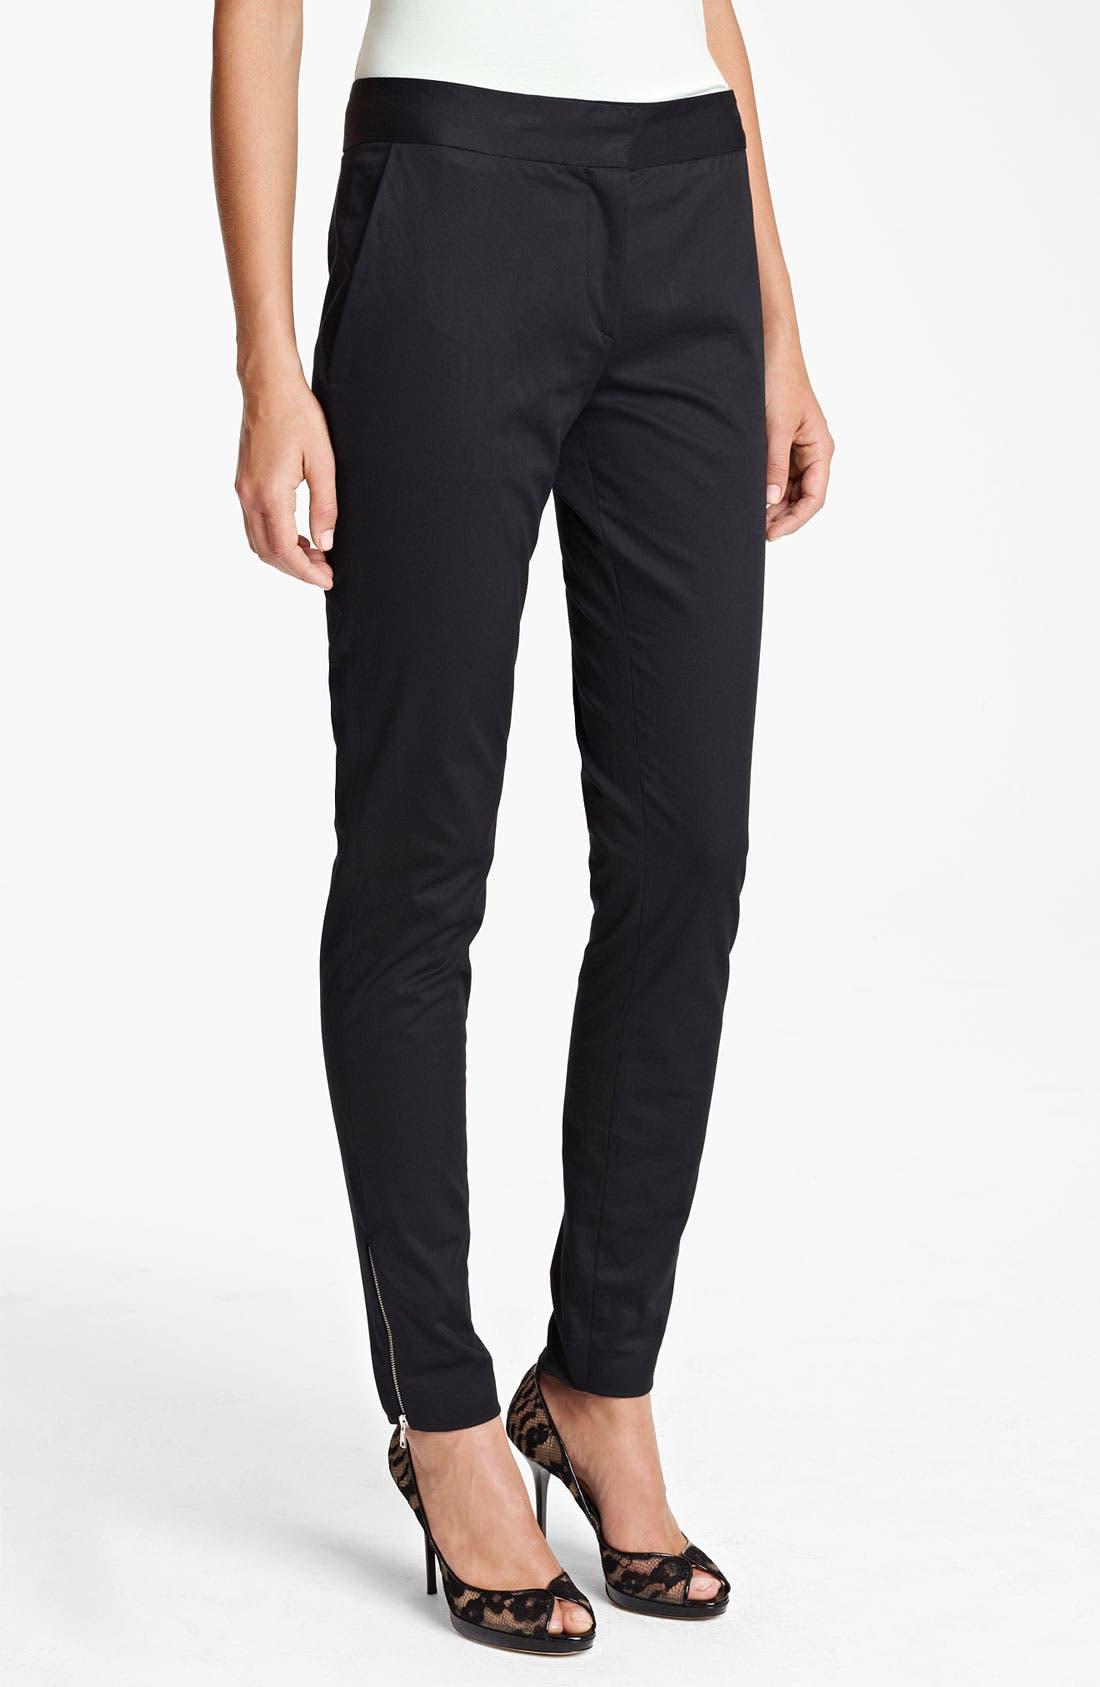 Alternate Image 1 Selected - Piazza Sempione Skinny Ankle Zip Pants